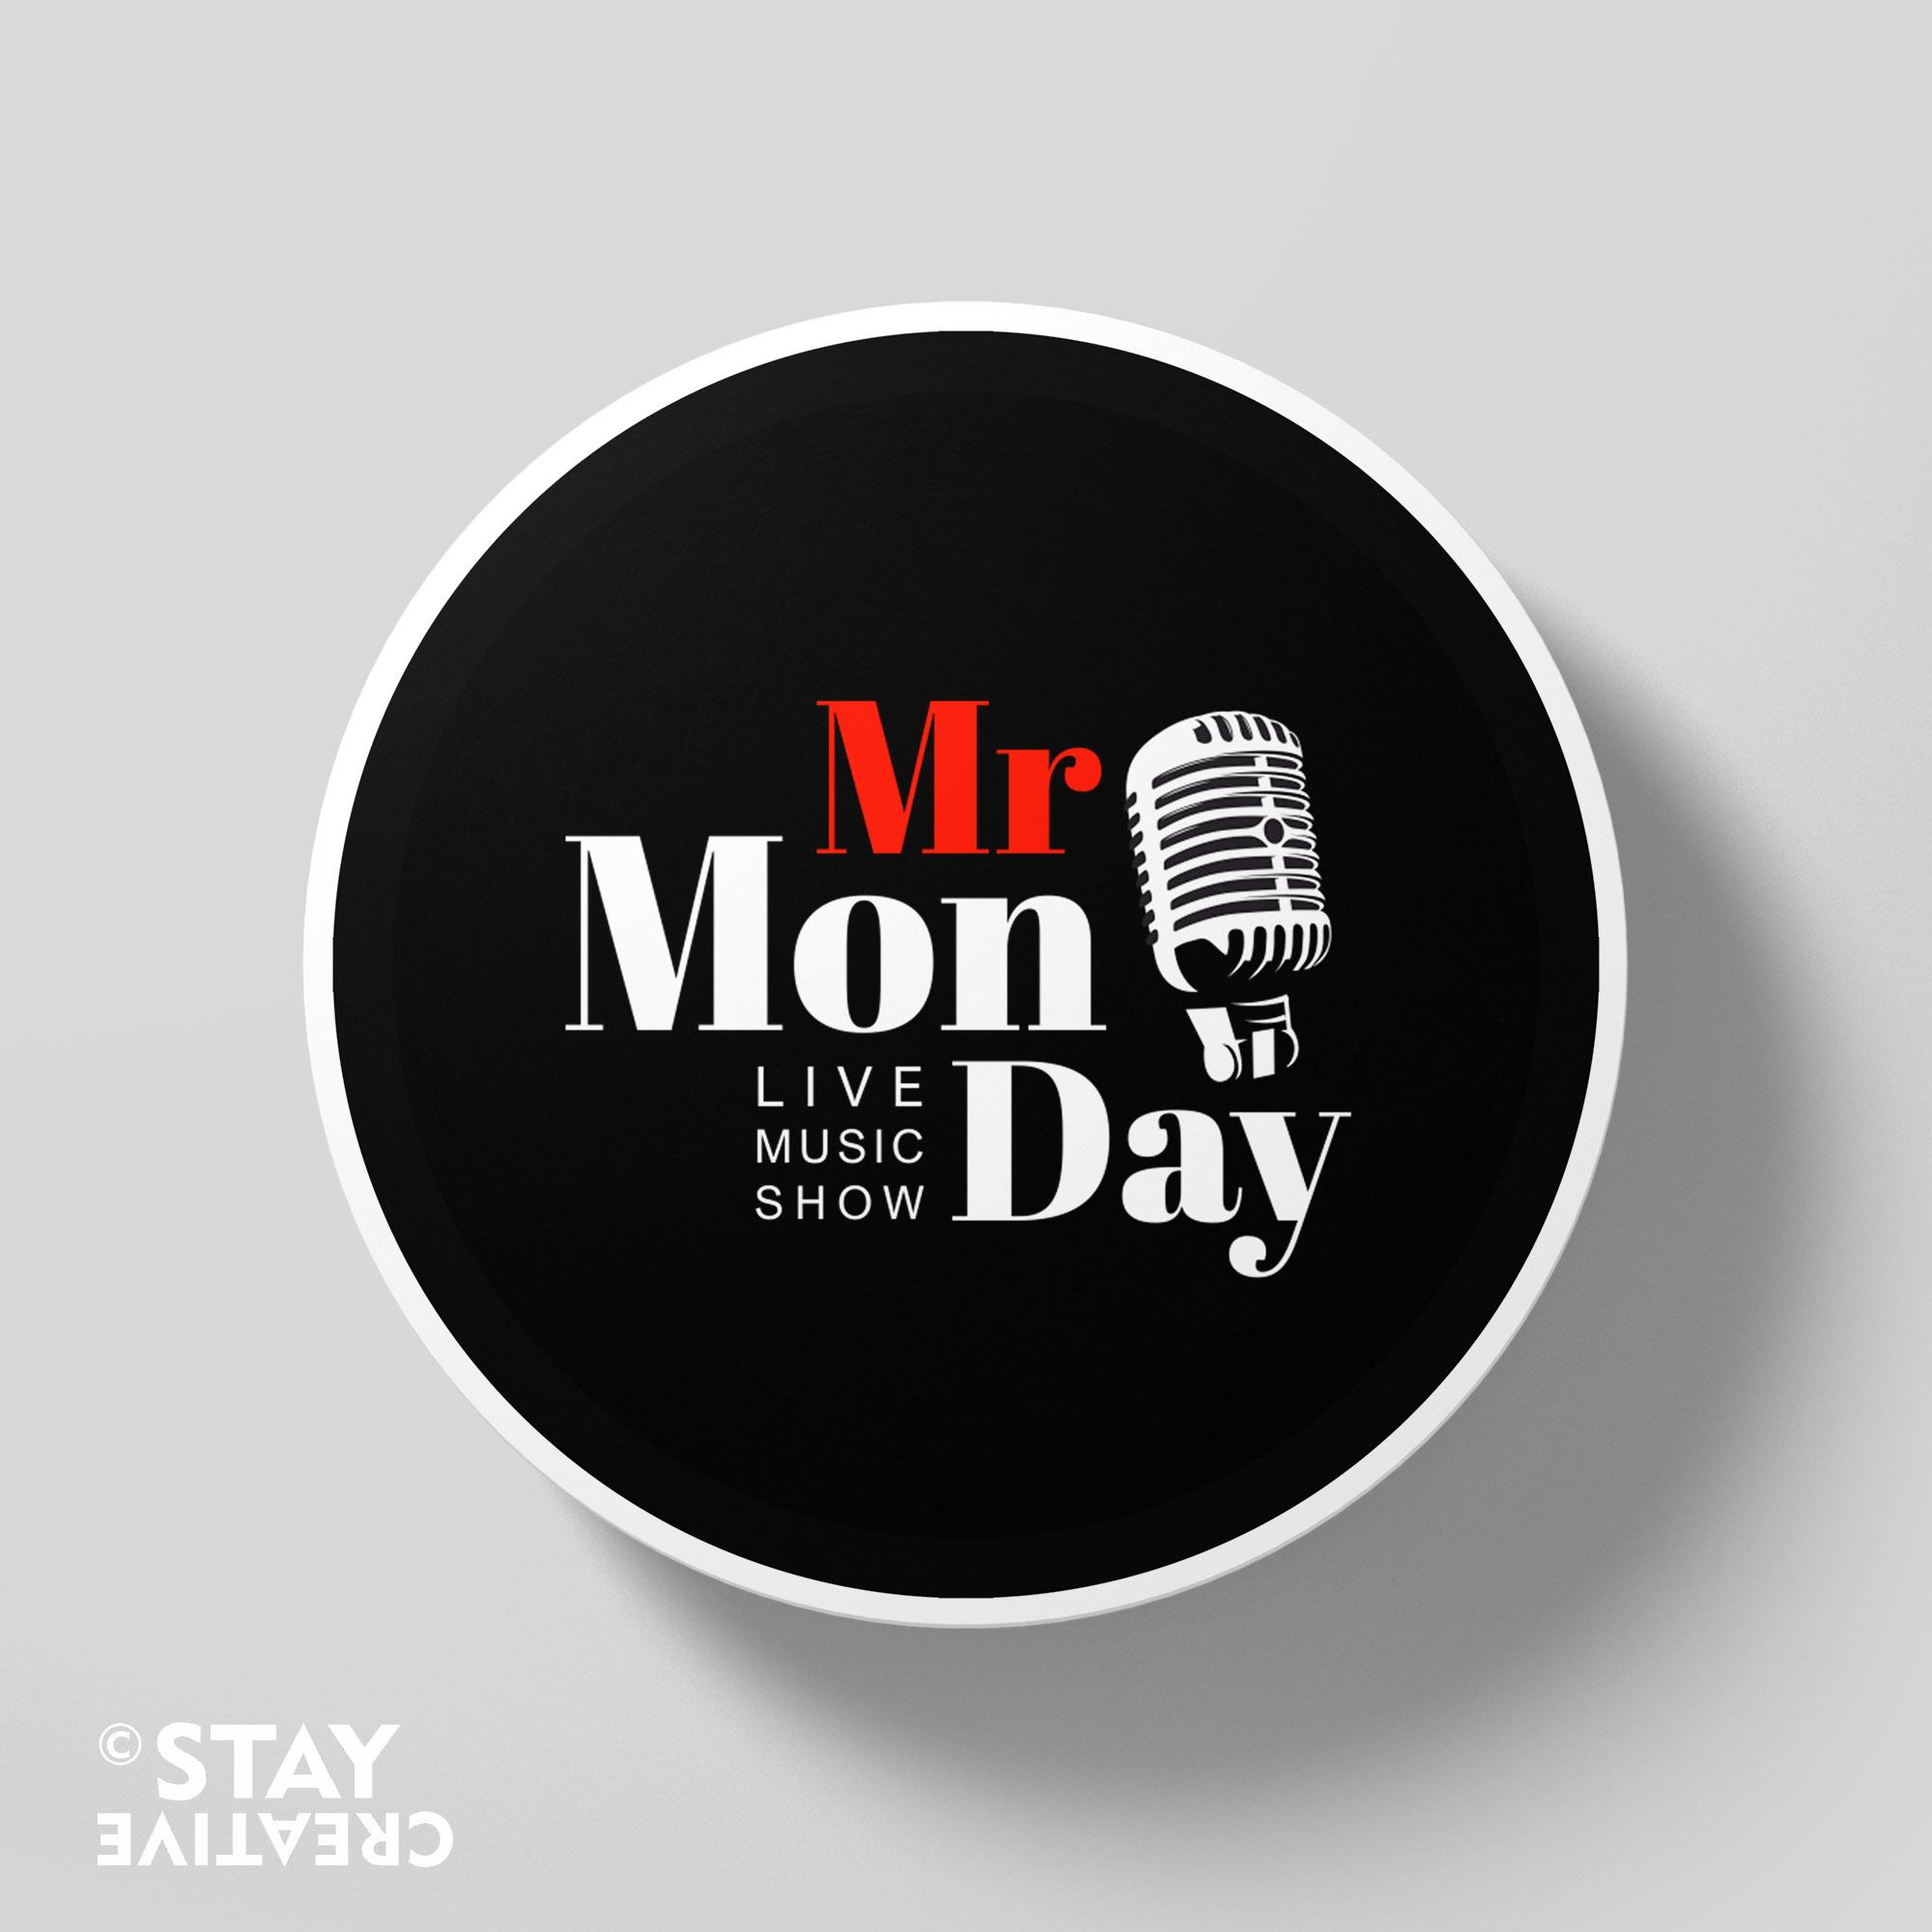 logo dla Youtubera Mr Monday (byStay Creative - Karolina Turlejska)